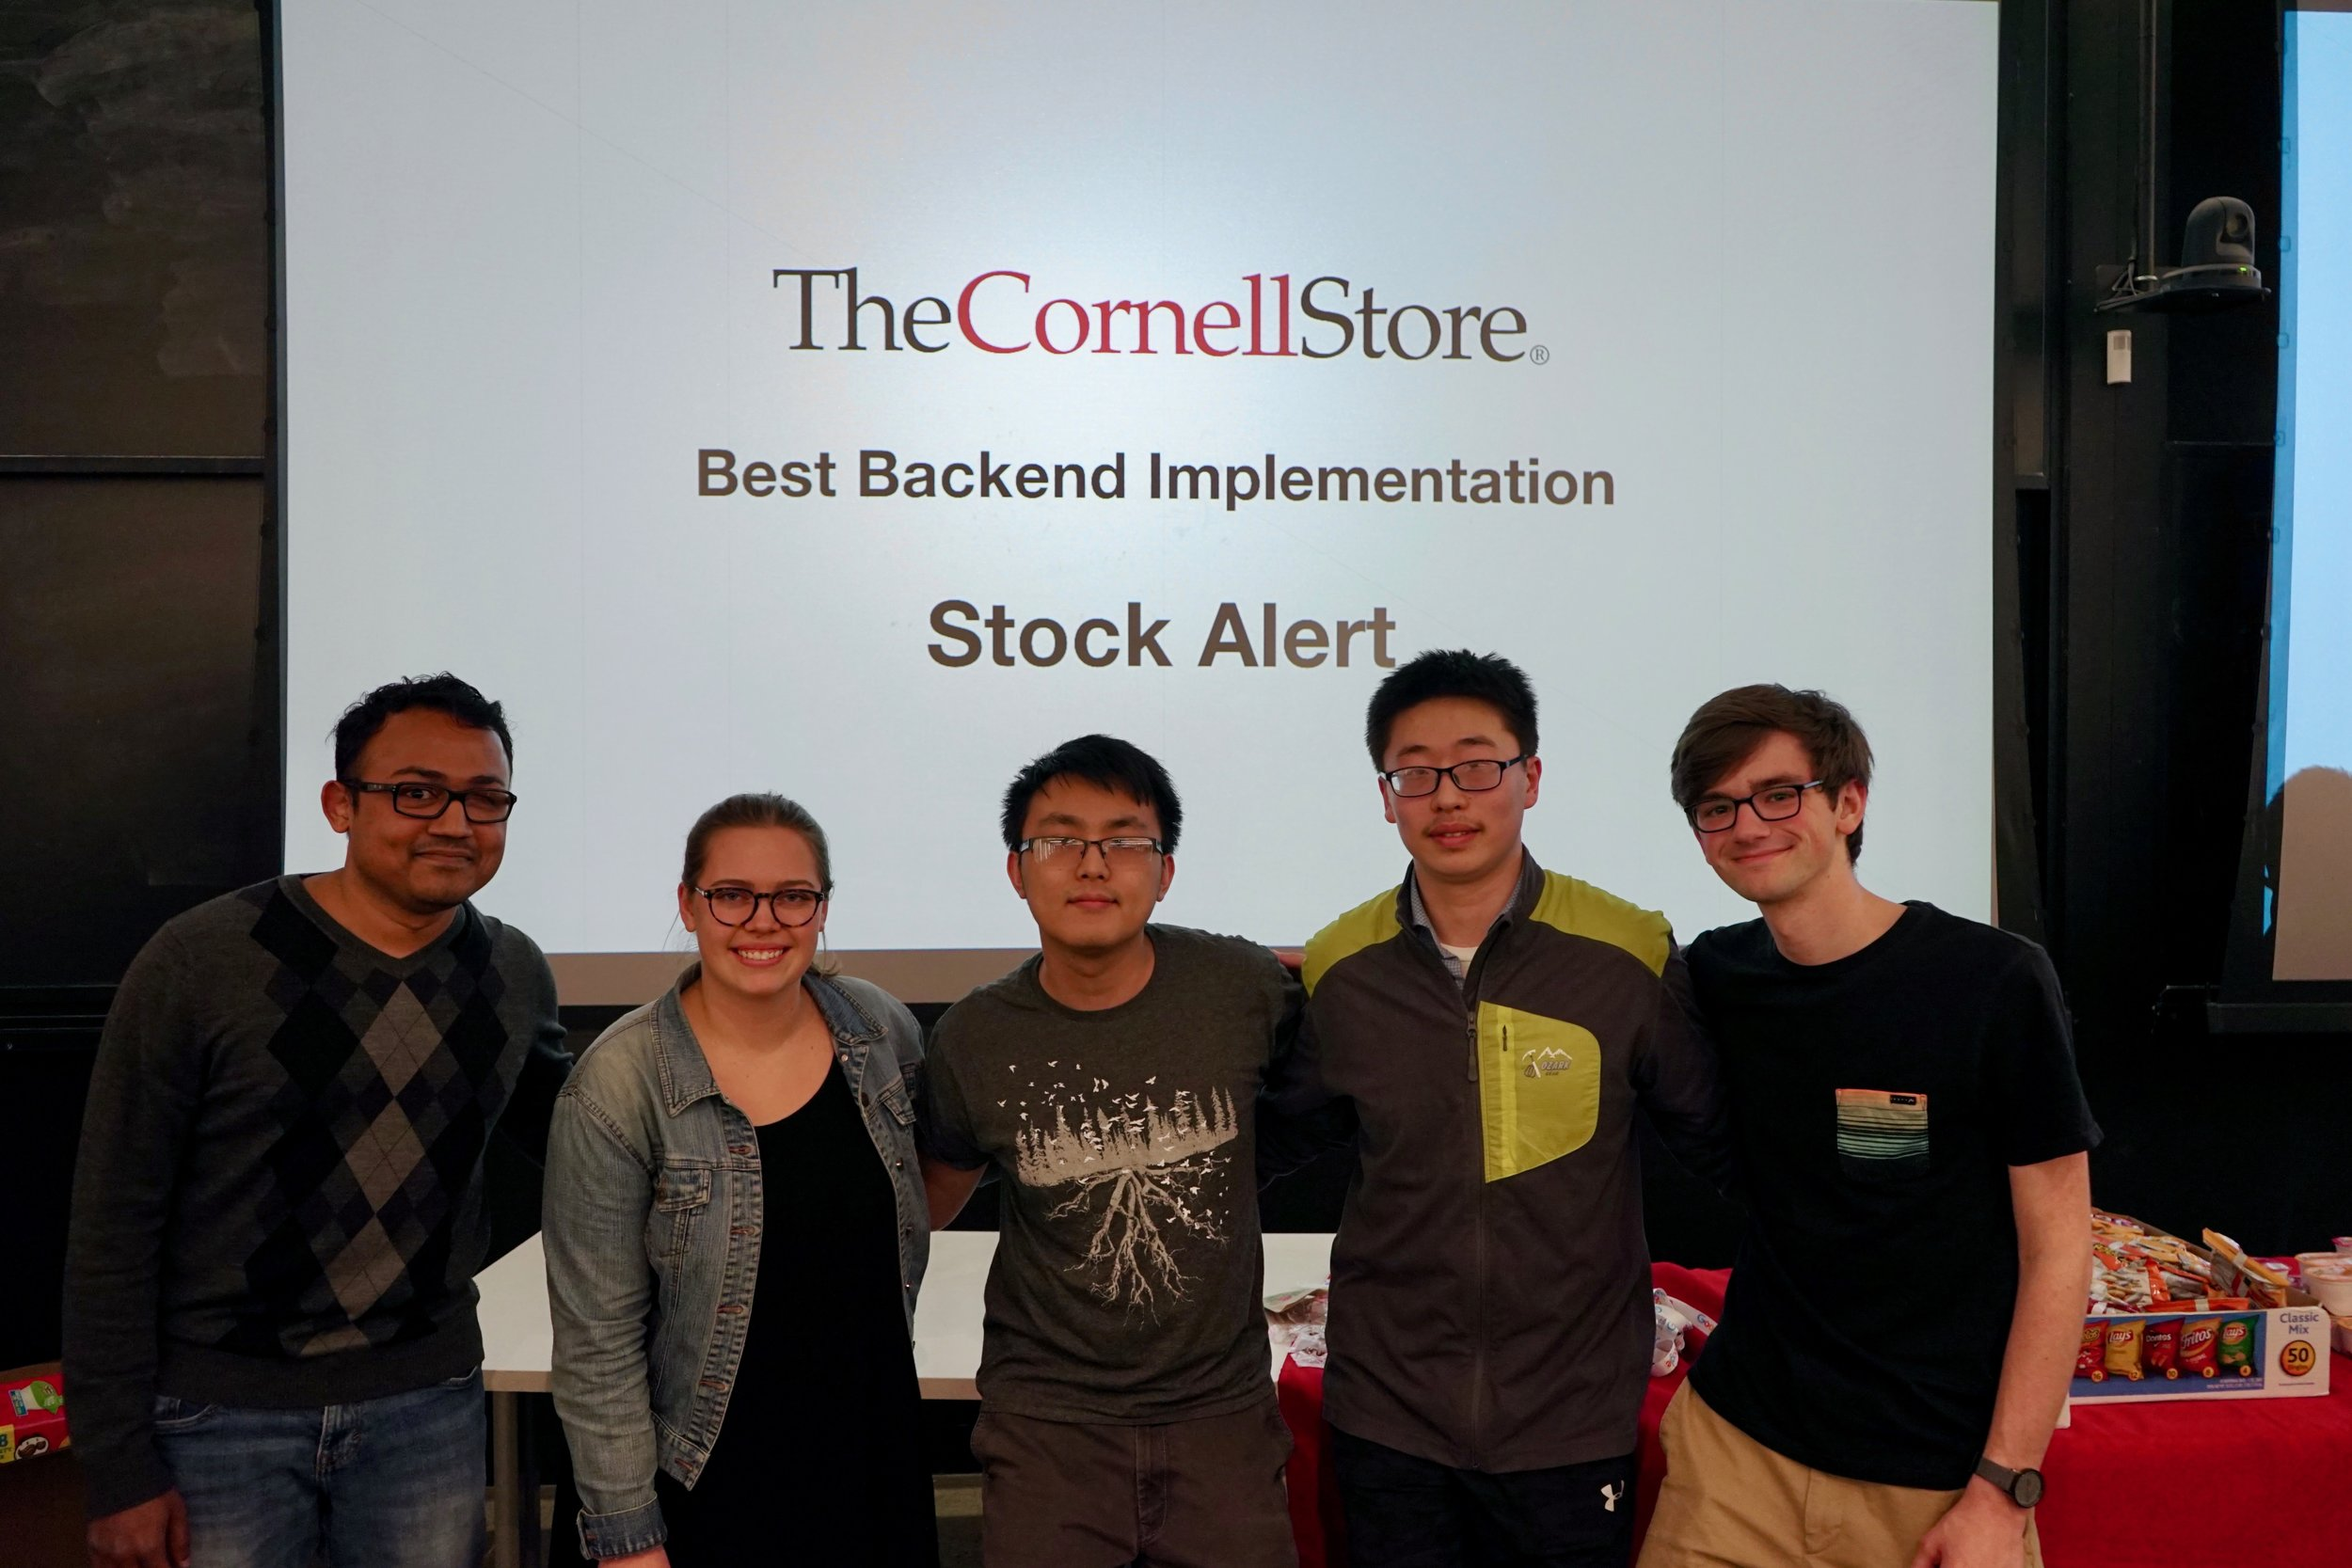 Annamalai Annamalai (iOS), Lily Croskey Englert (iOS), Kevin Chen (Backend), Zhengxun Wu (Backend), Joe Fulgieri (TA)